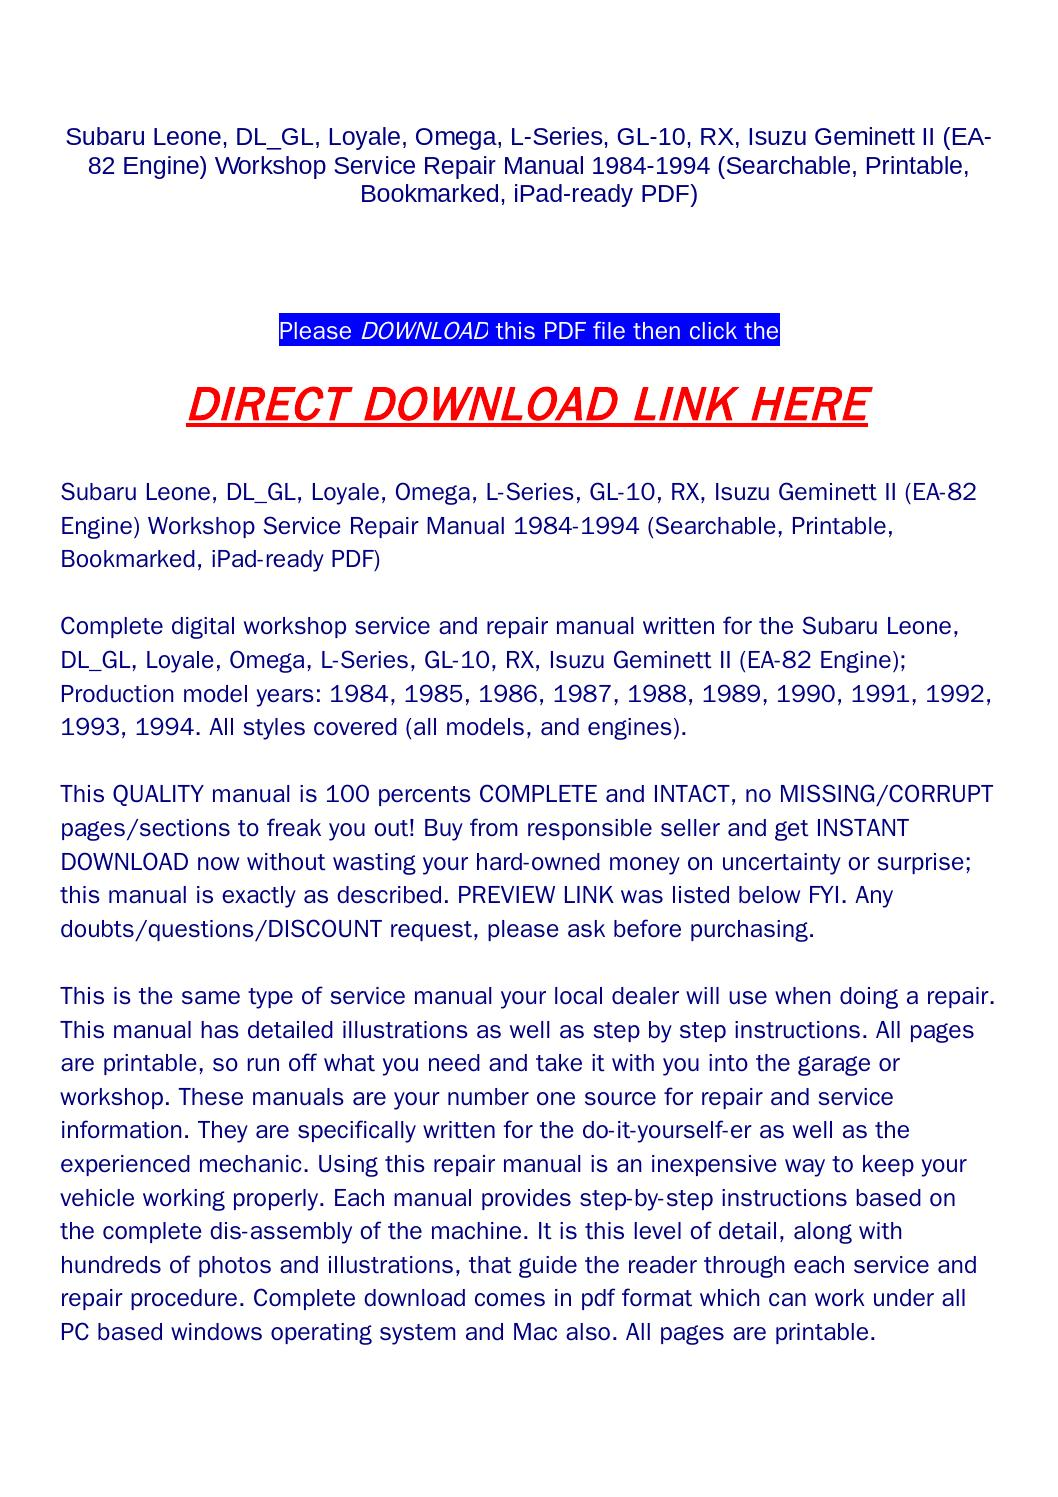 hight resolution of subaru leone dl gl loyale omega l series gl 10